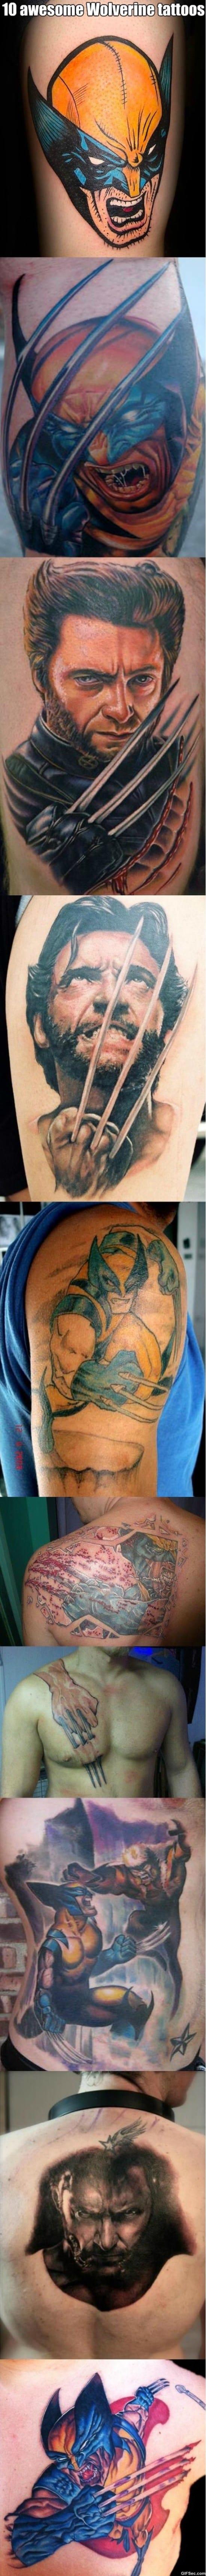 10-awesome-wolverine-tattoos-meme-2015